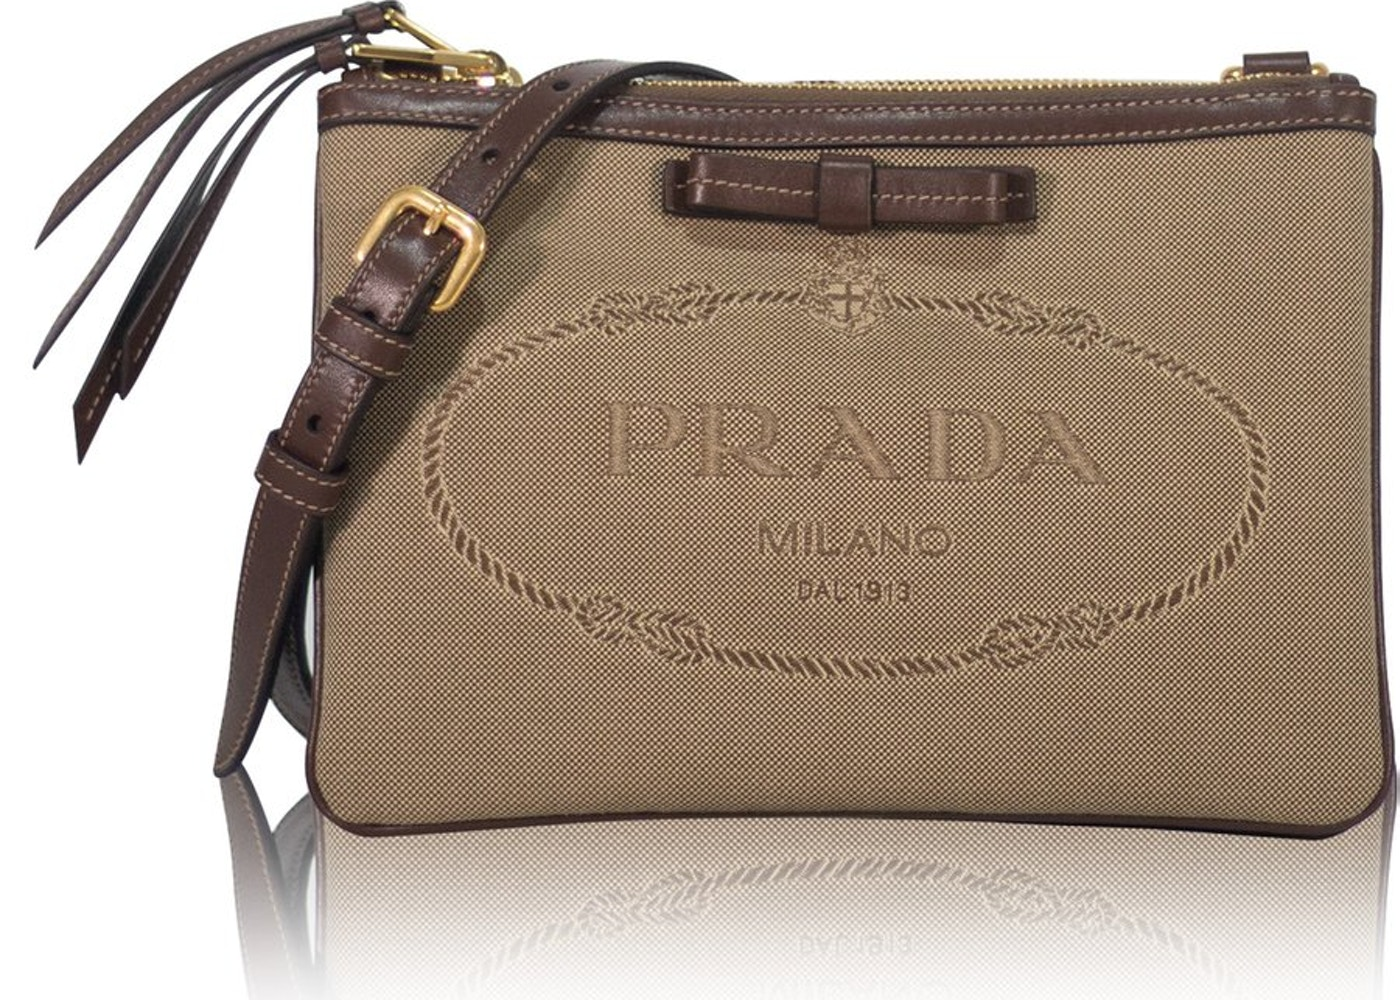 dc6ee0448a Prada Jacquard Crossbody Bag Logo Brown Beige. Logo Brown Beige